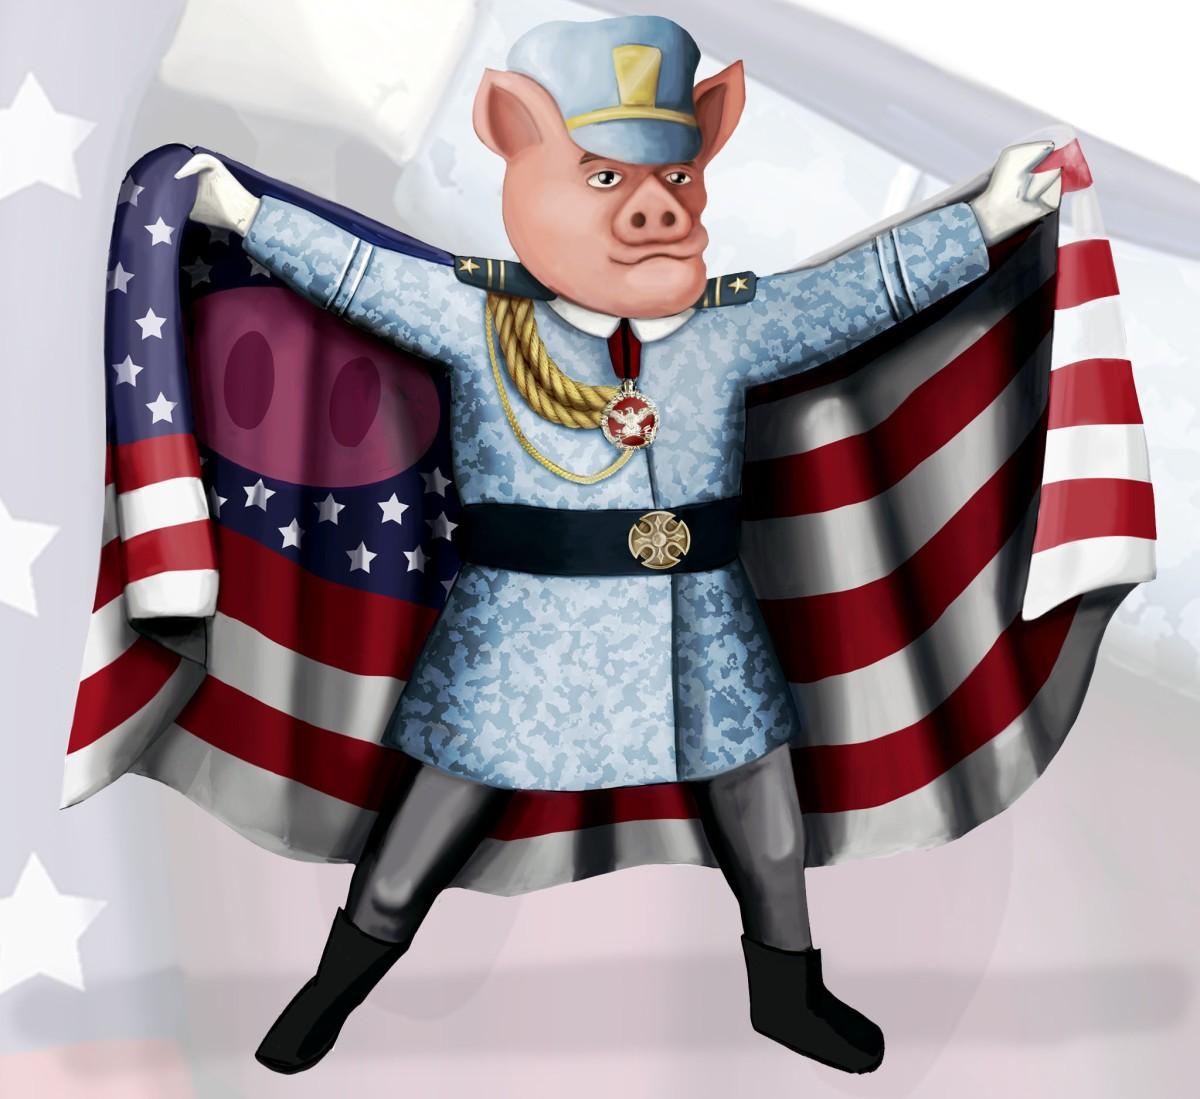 Hogs of War (2000) Reboot: Character and Uniform Design